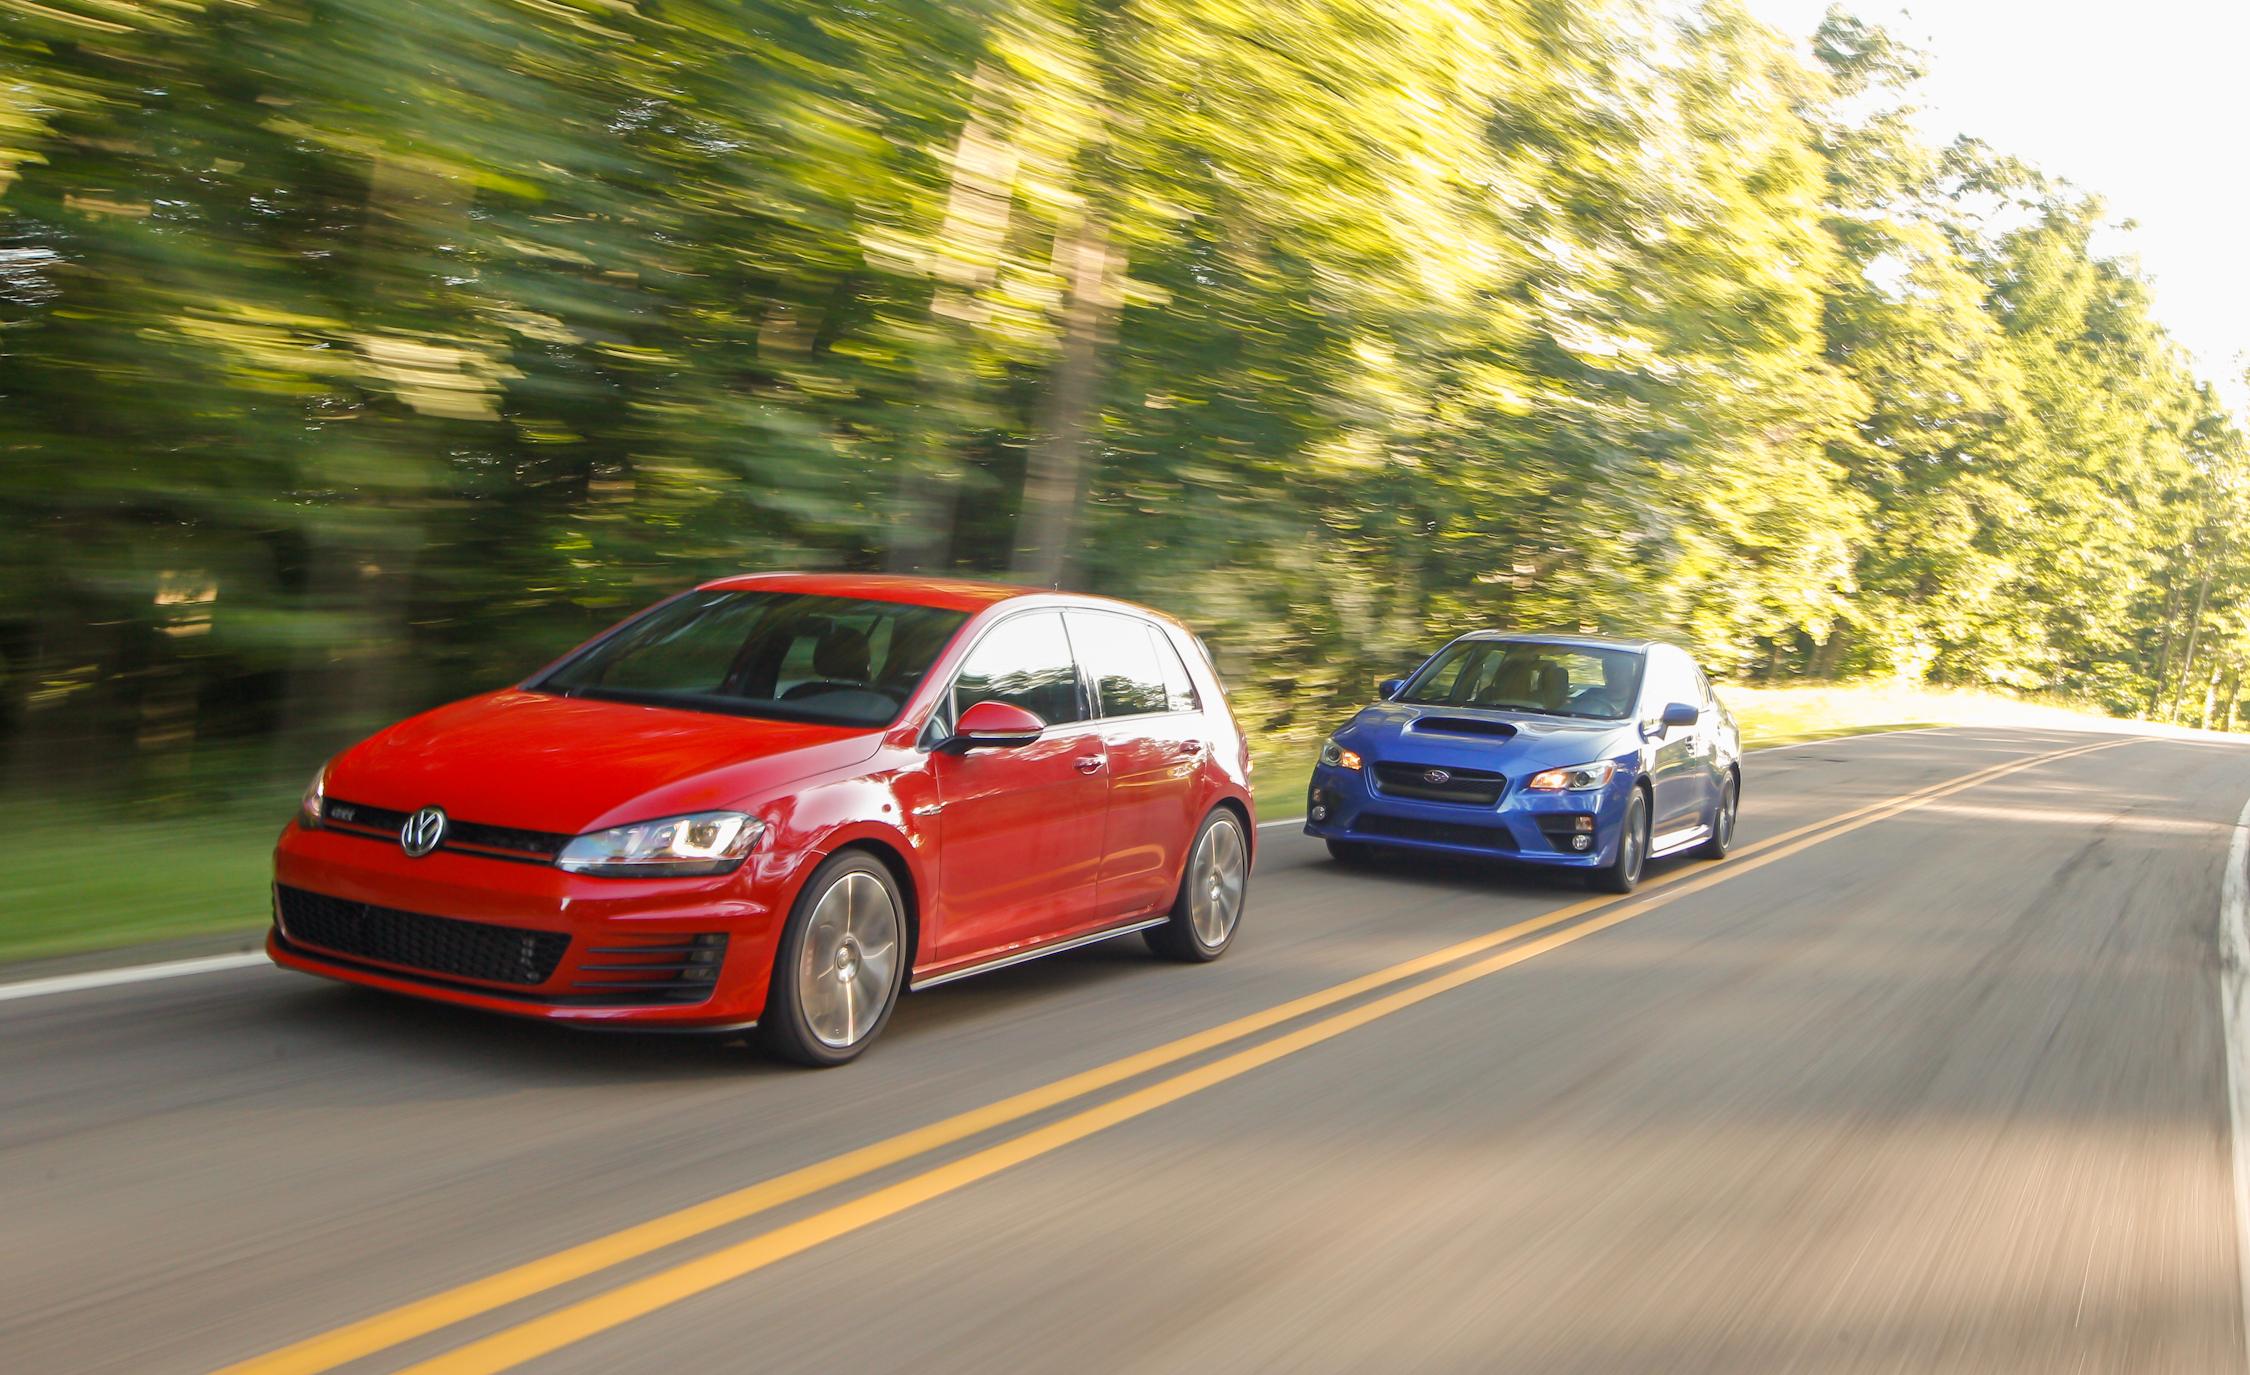 Volkswagen GTI vs 2015 Subaru WRX Comparison